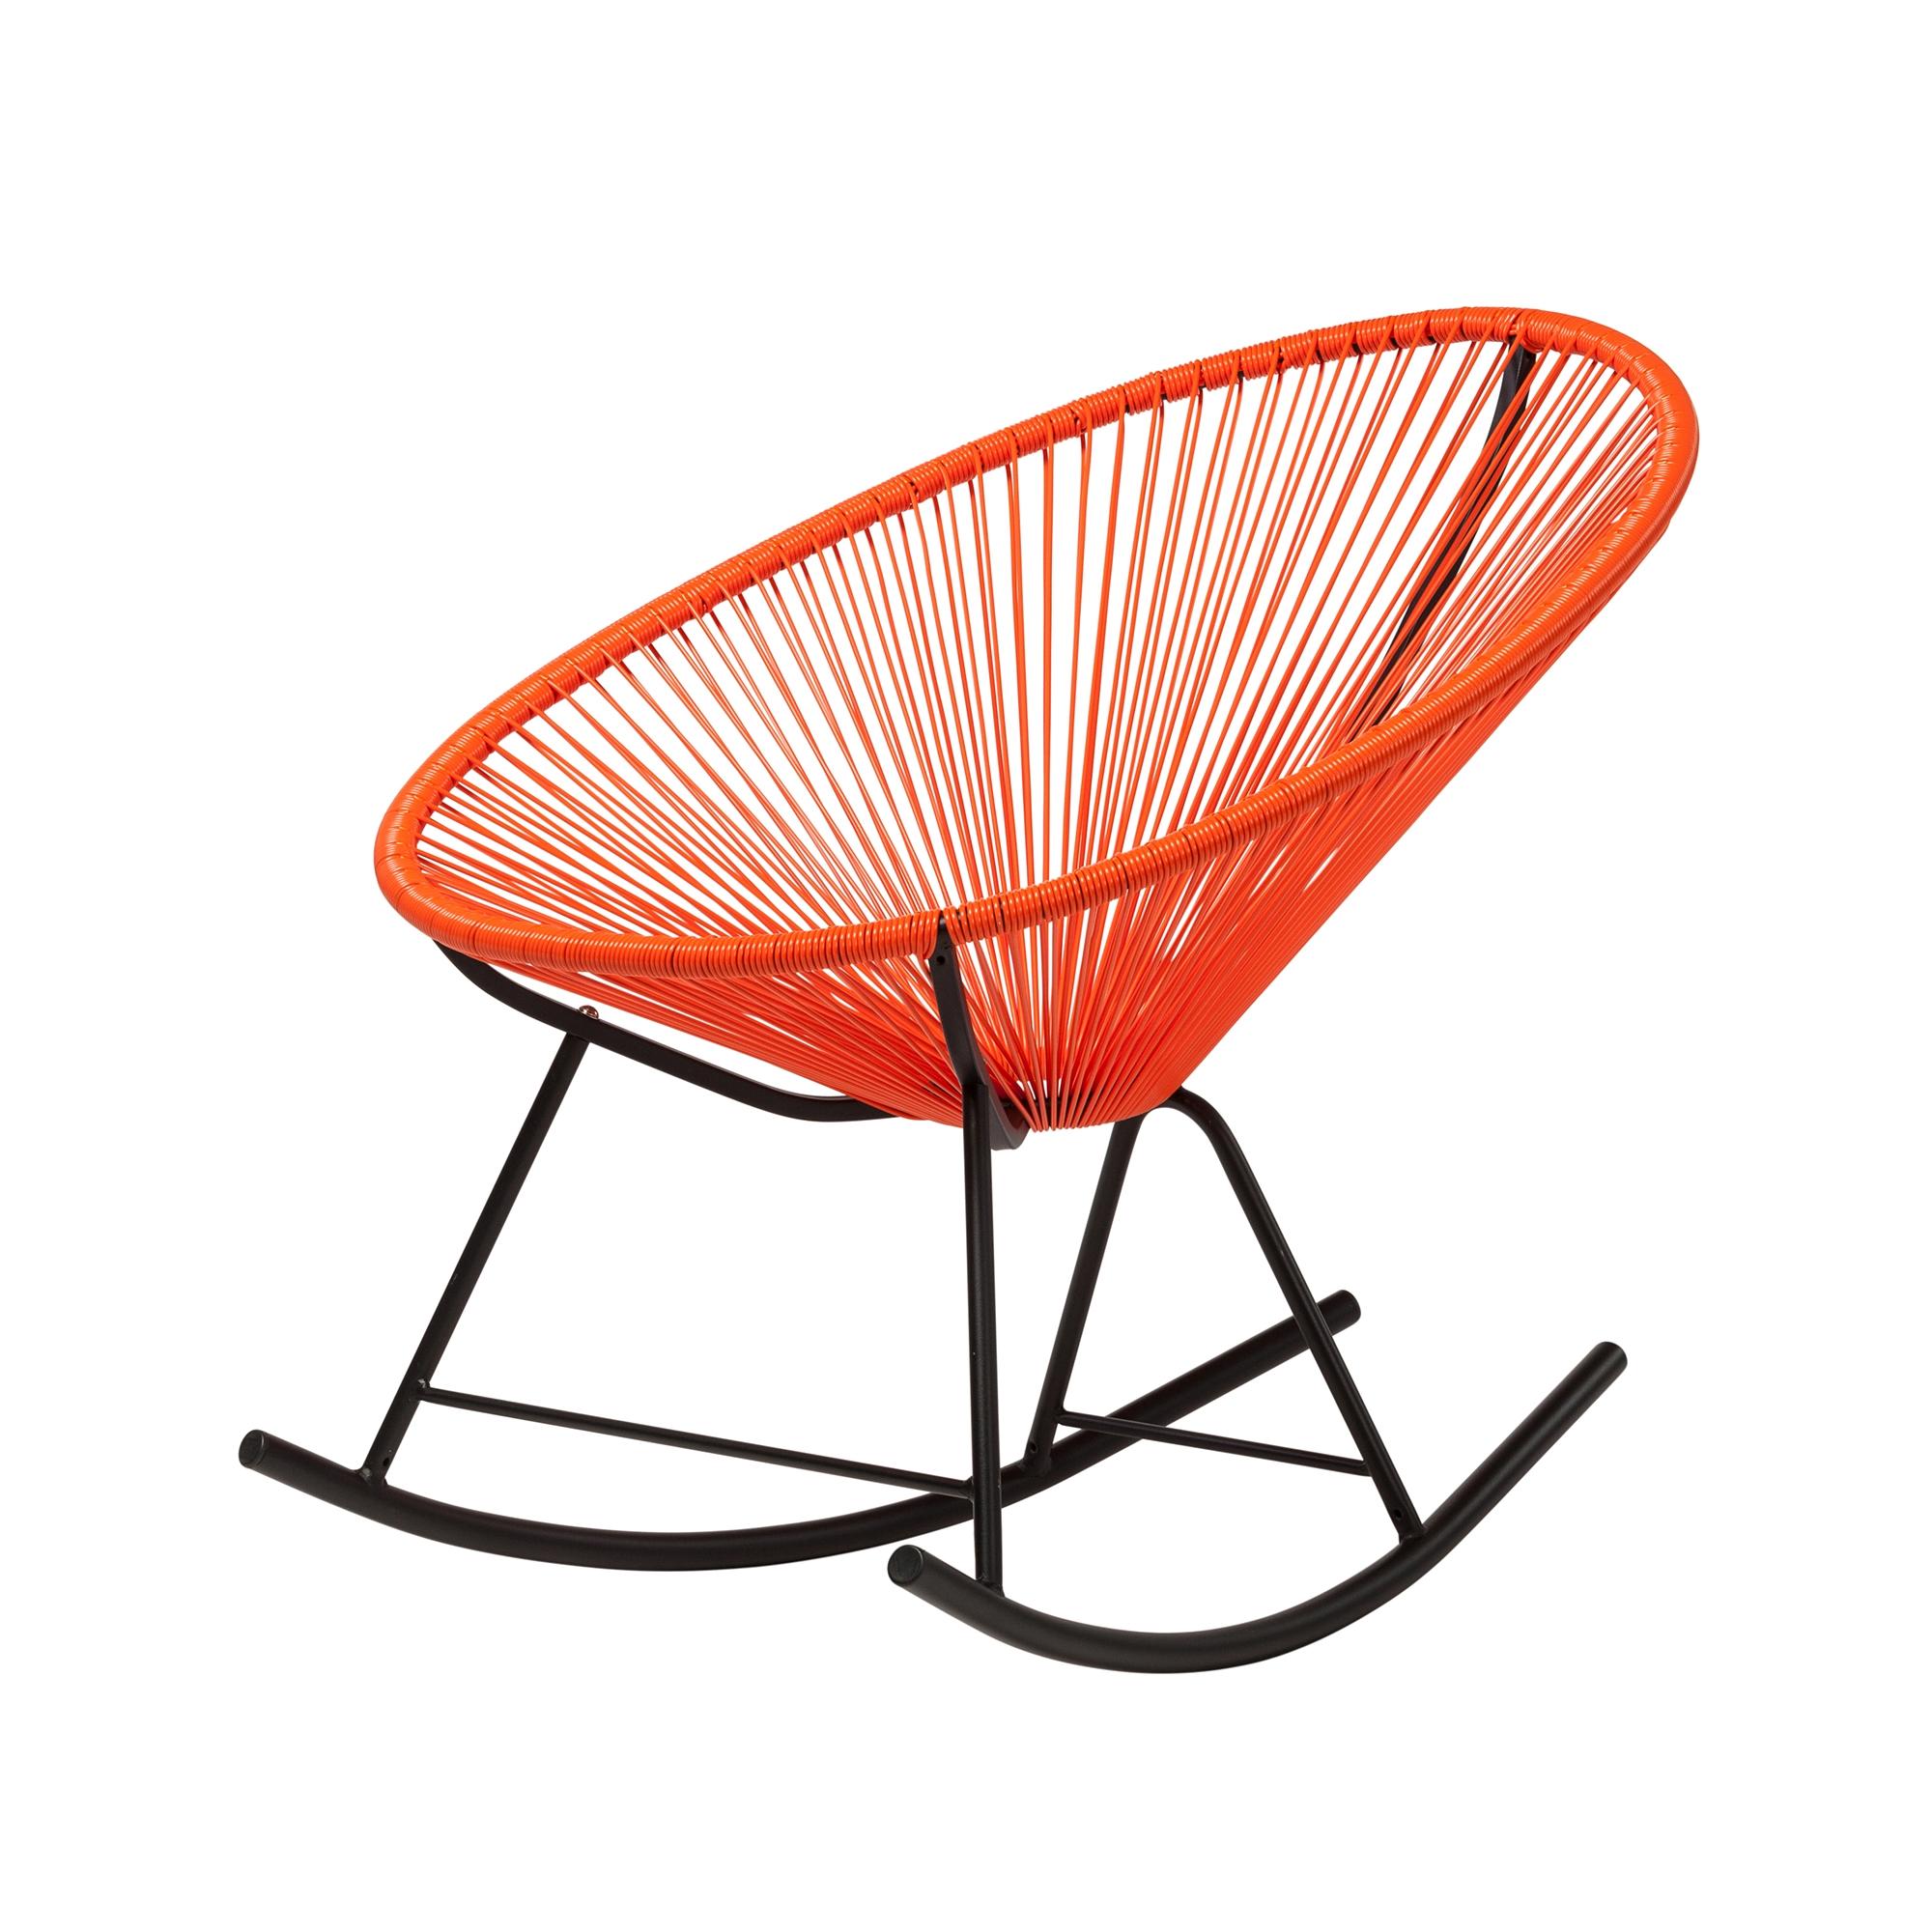 Magnificent Acapulco Indoor Outdoor Rocking Chair In Orange Unemploymentrelief Wooden Chair Designs For Living Room Unemploymentrelieforg